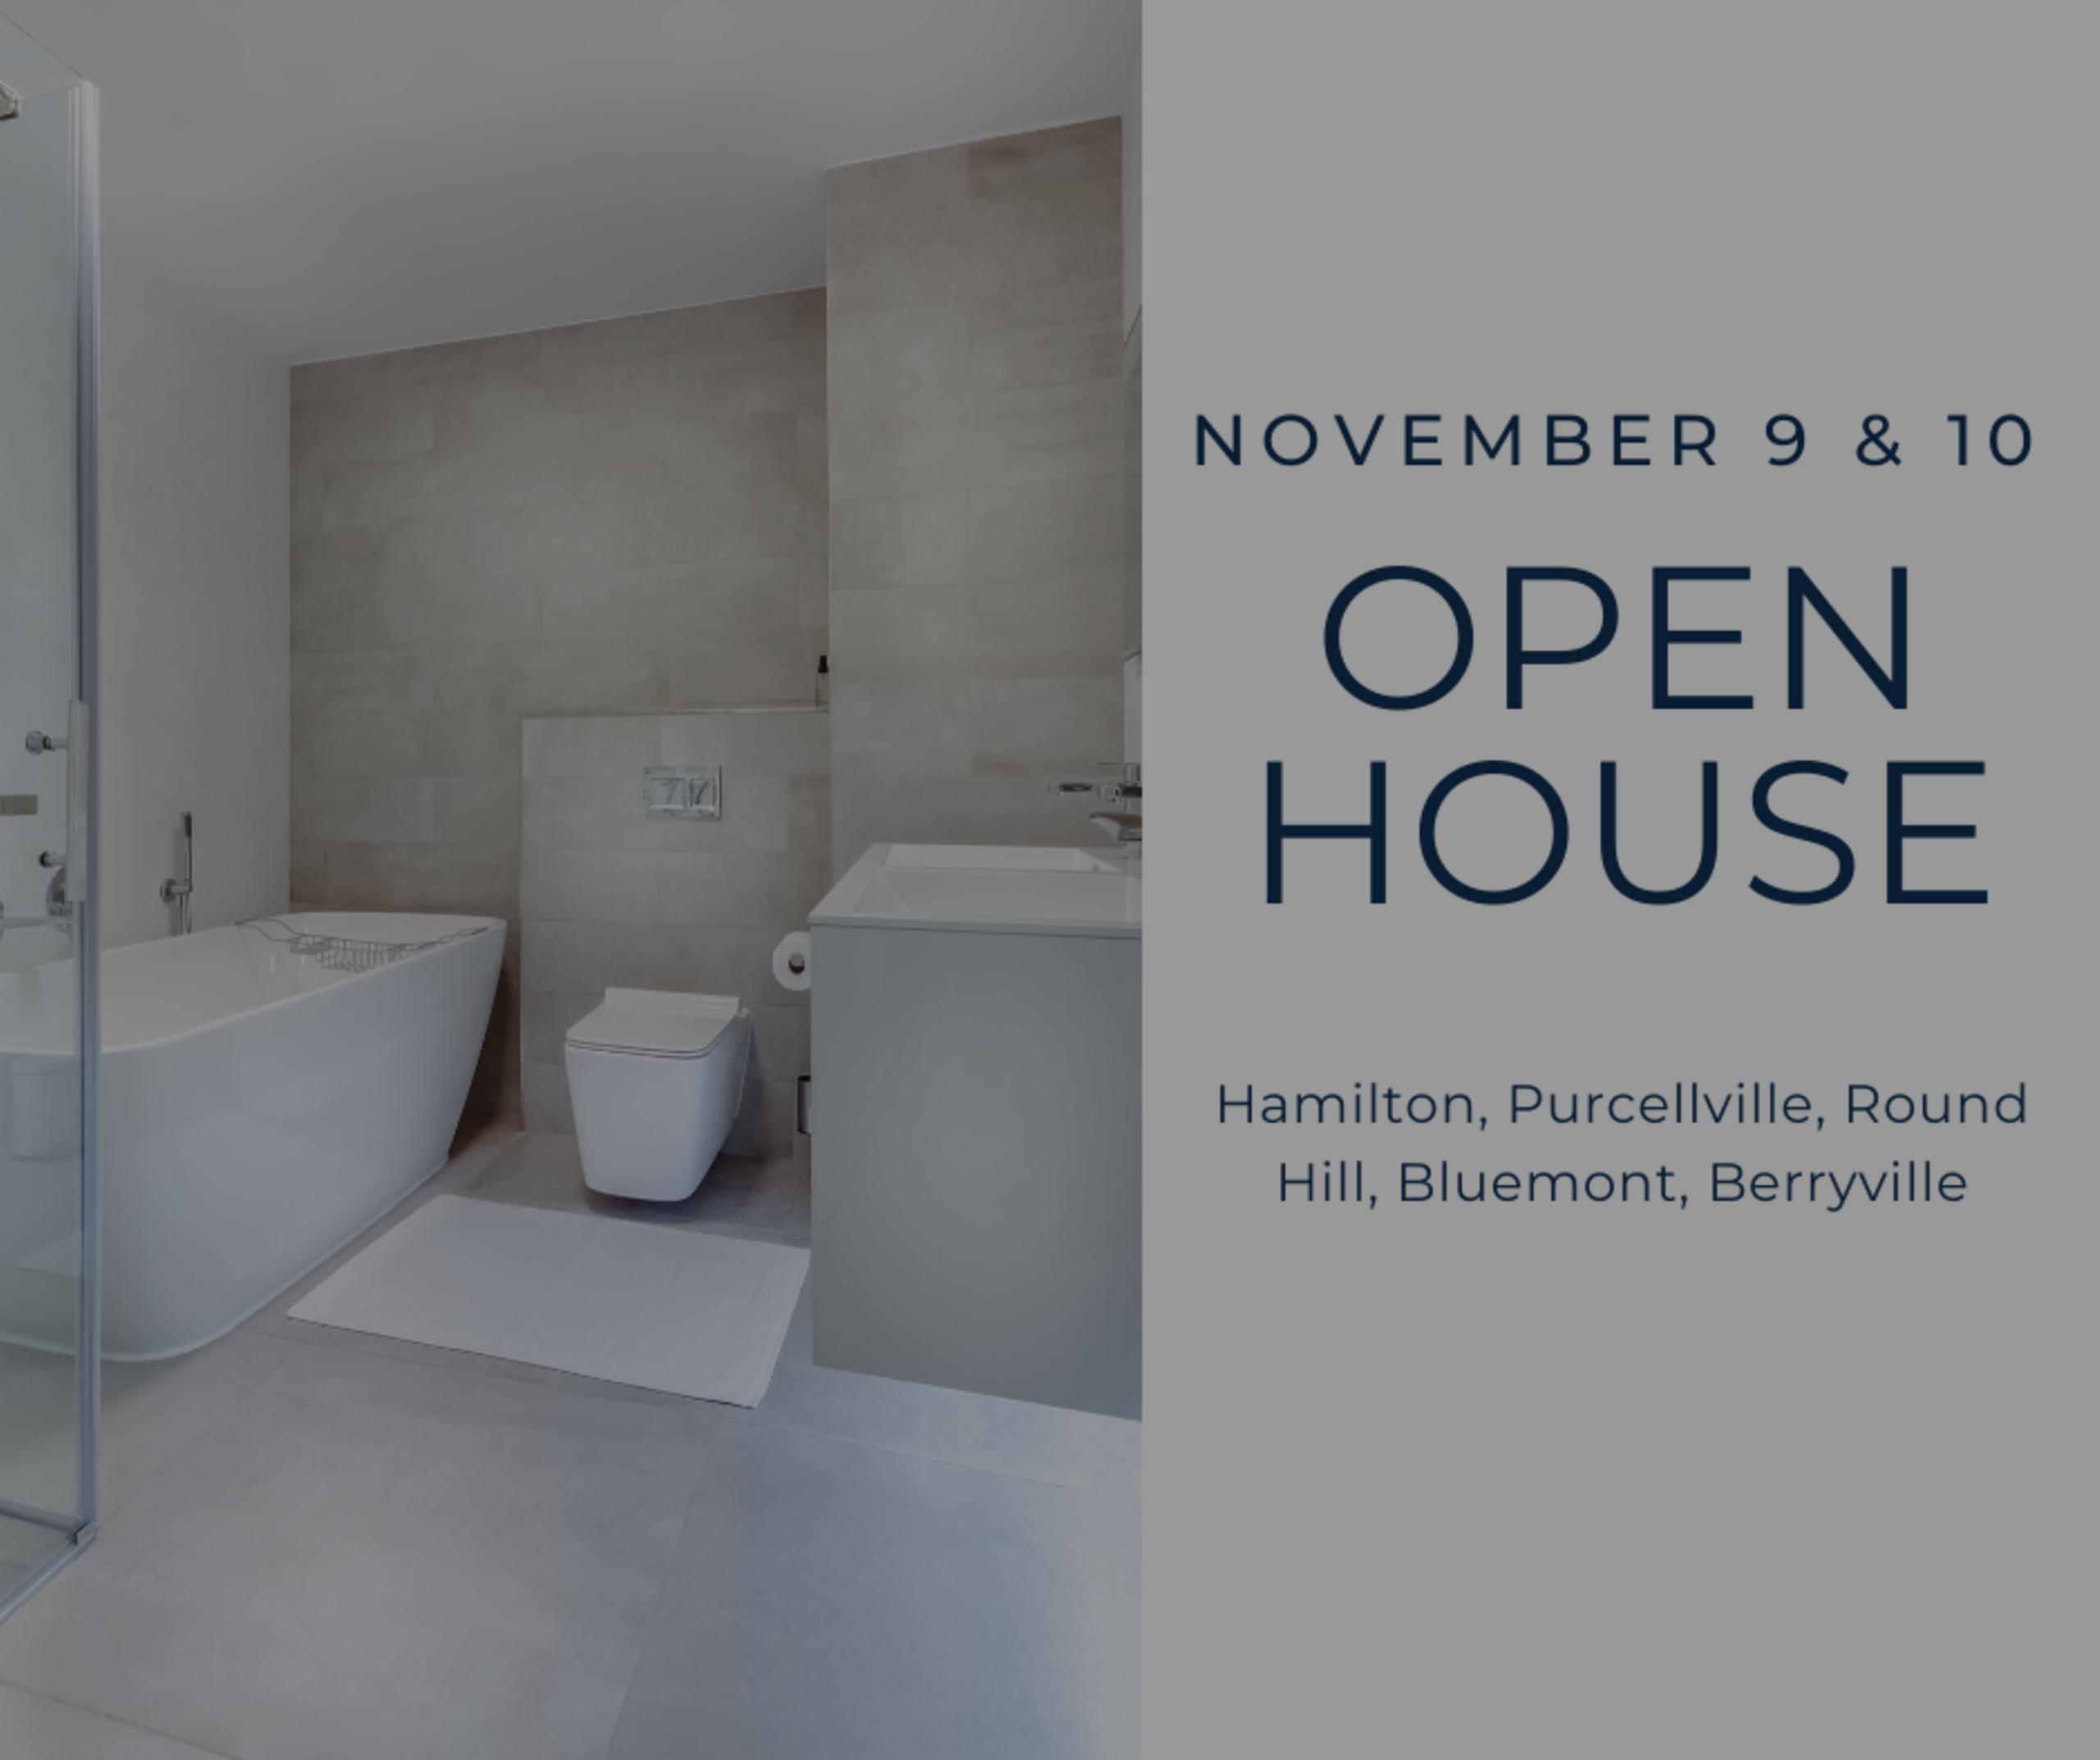 Open House List 11/9/19 – 11/10/19